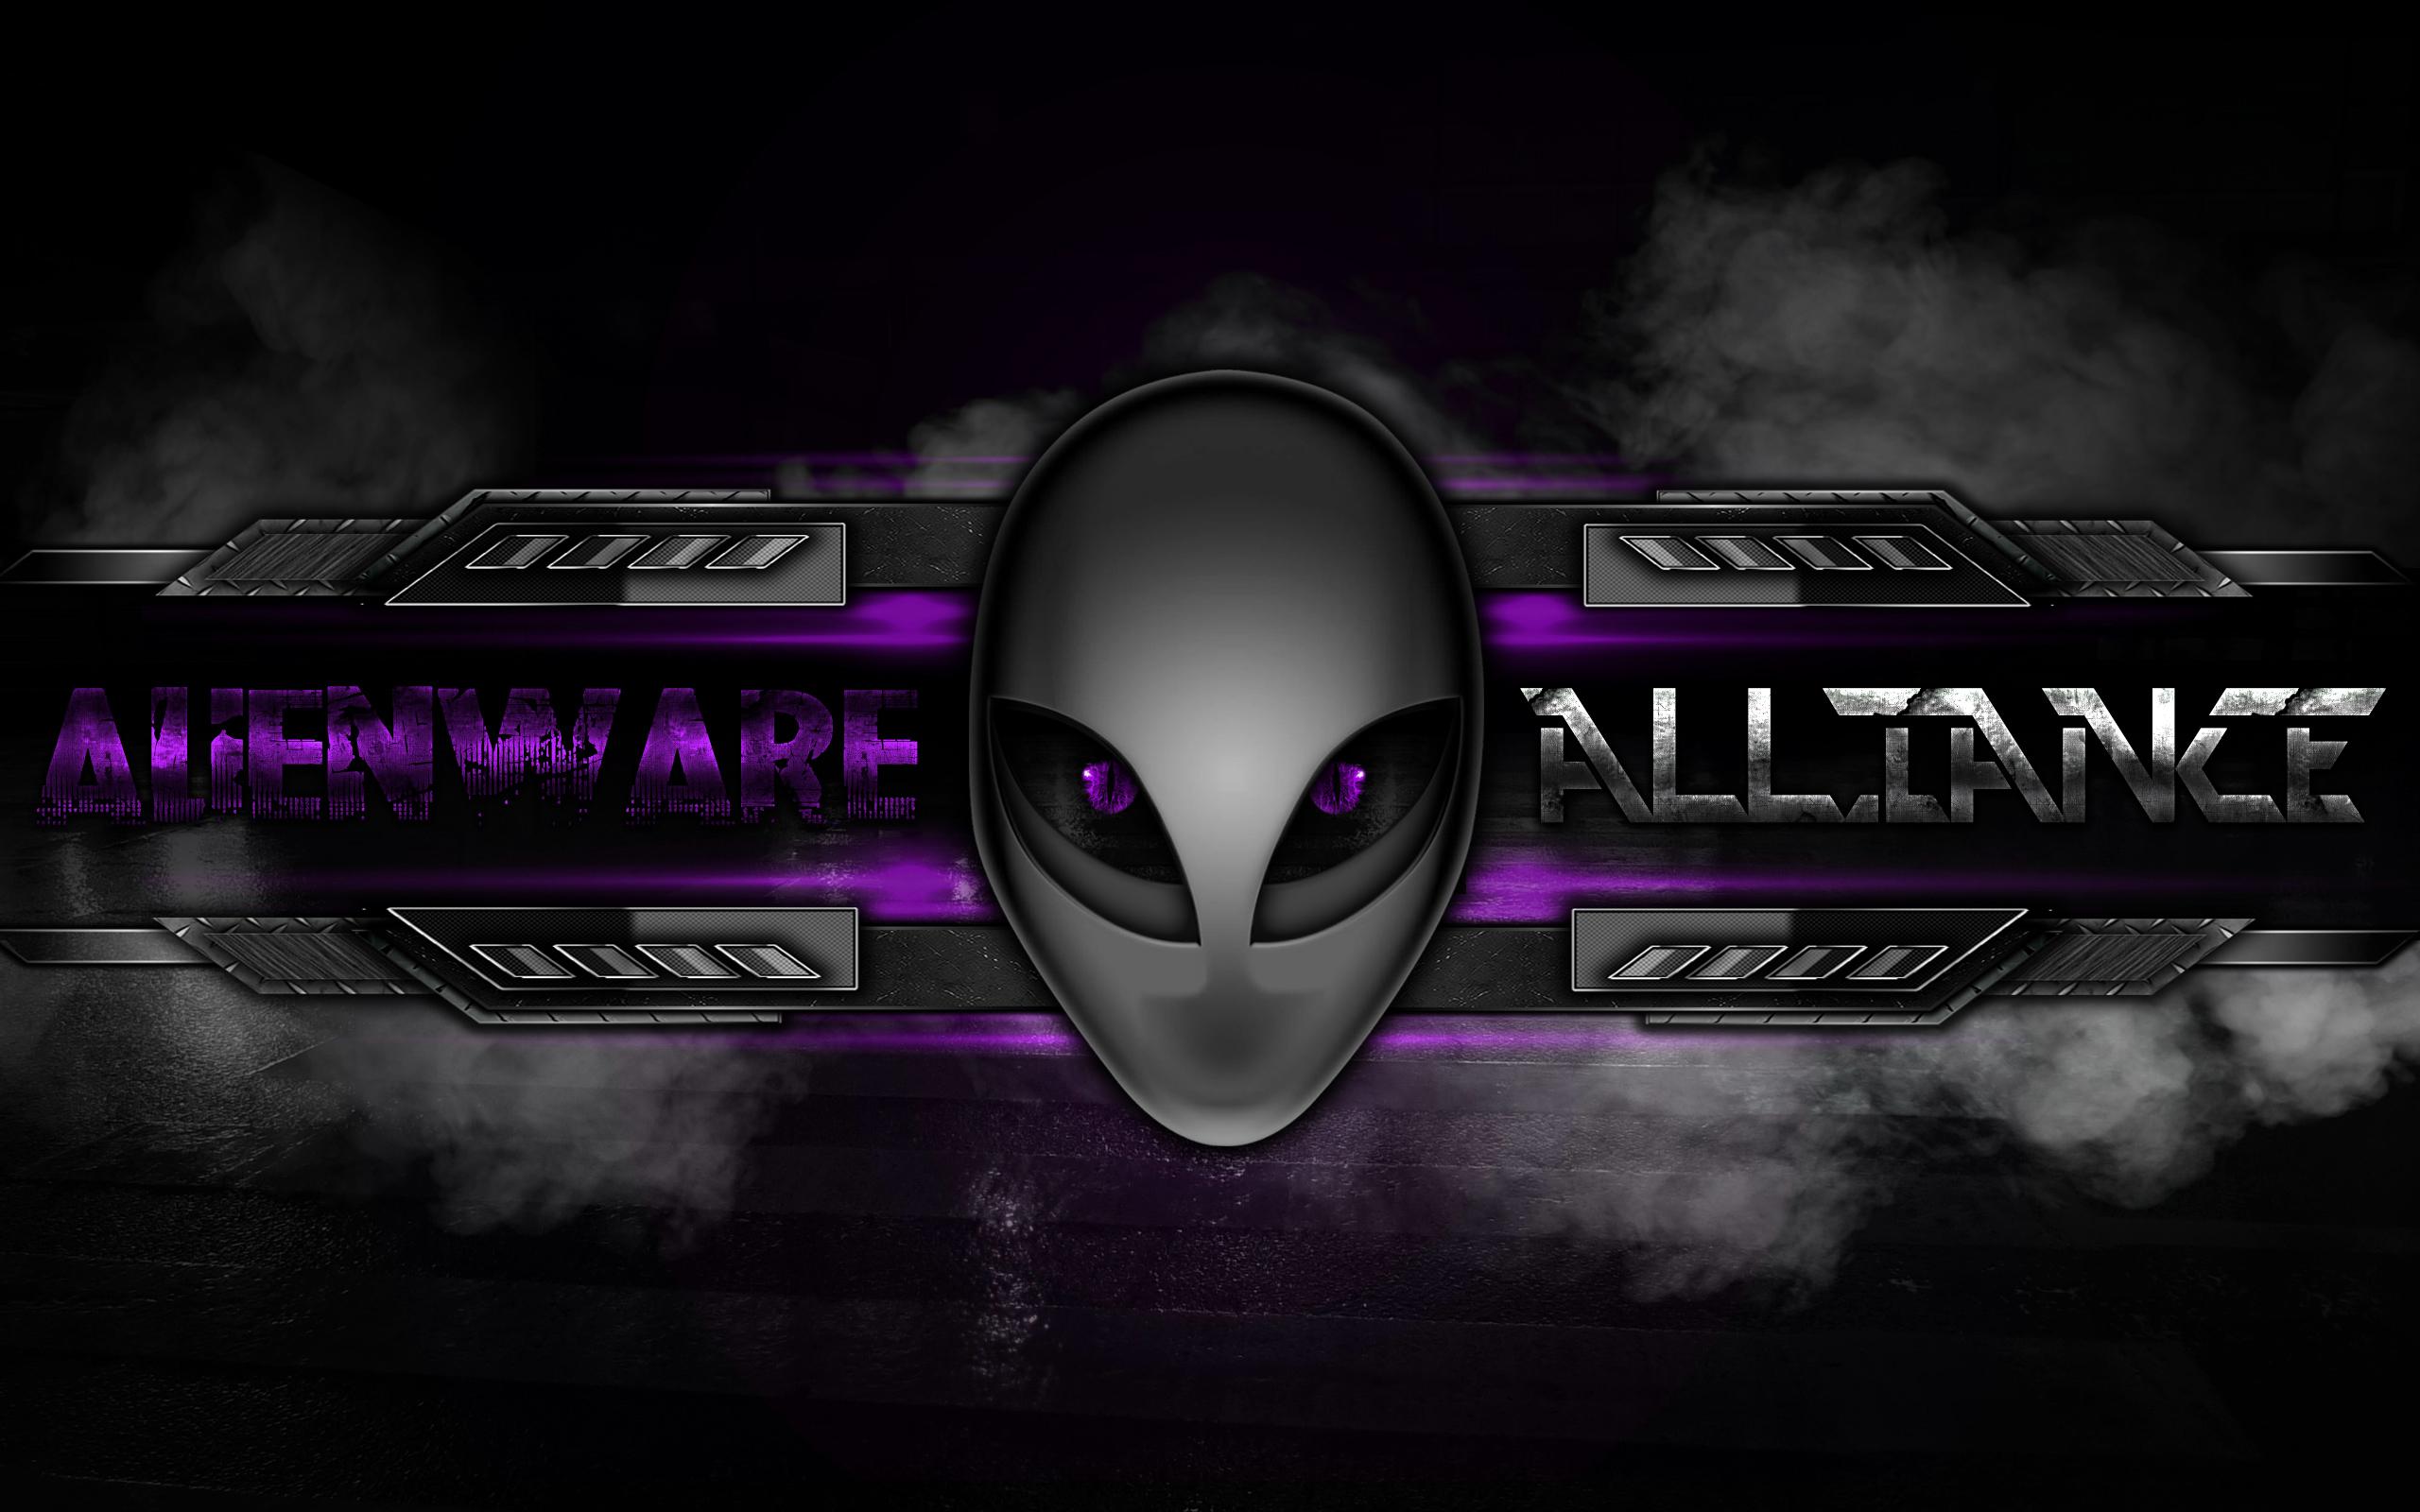 Alienware Windows 7 Theme wallpaper   1061165 2560x1600